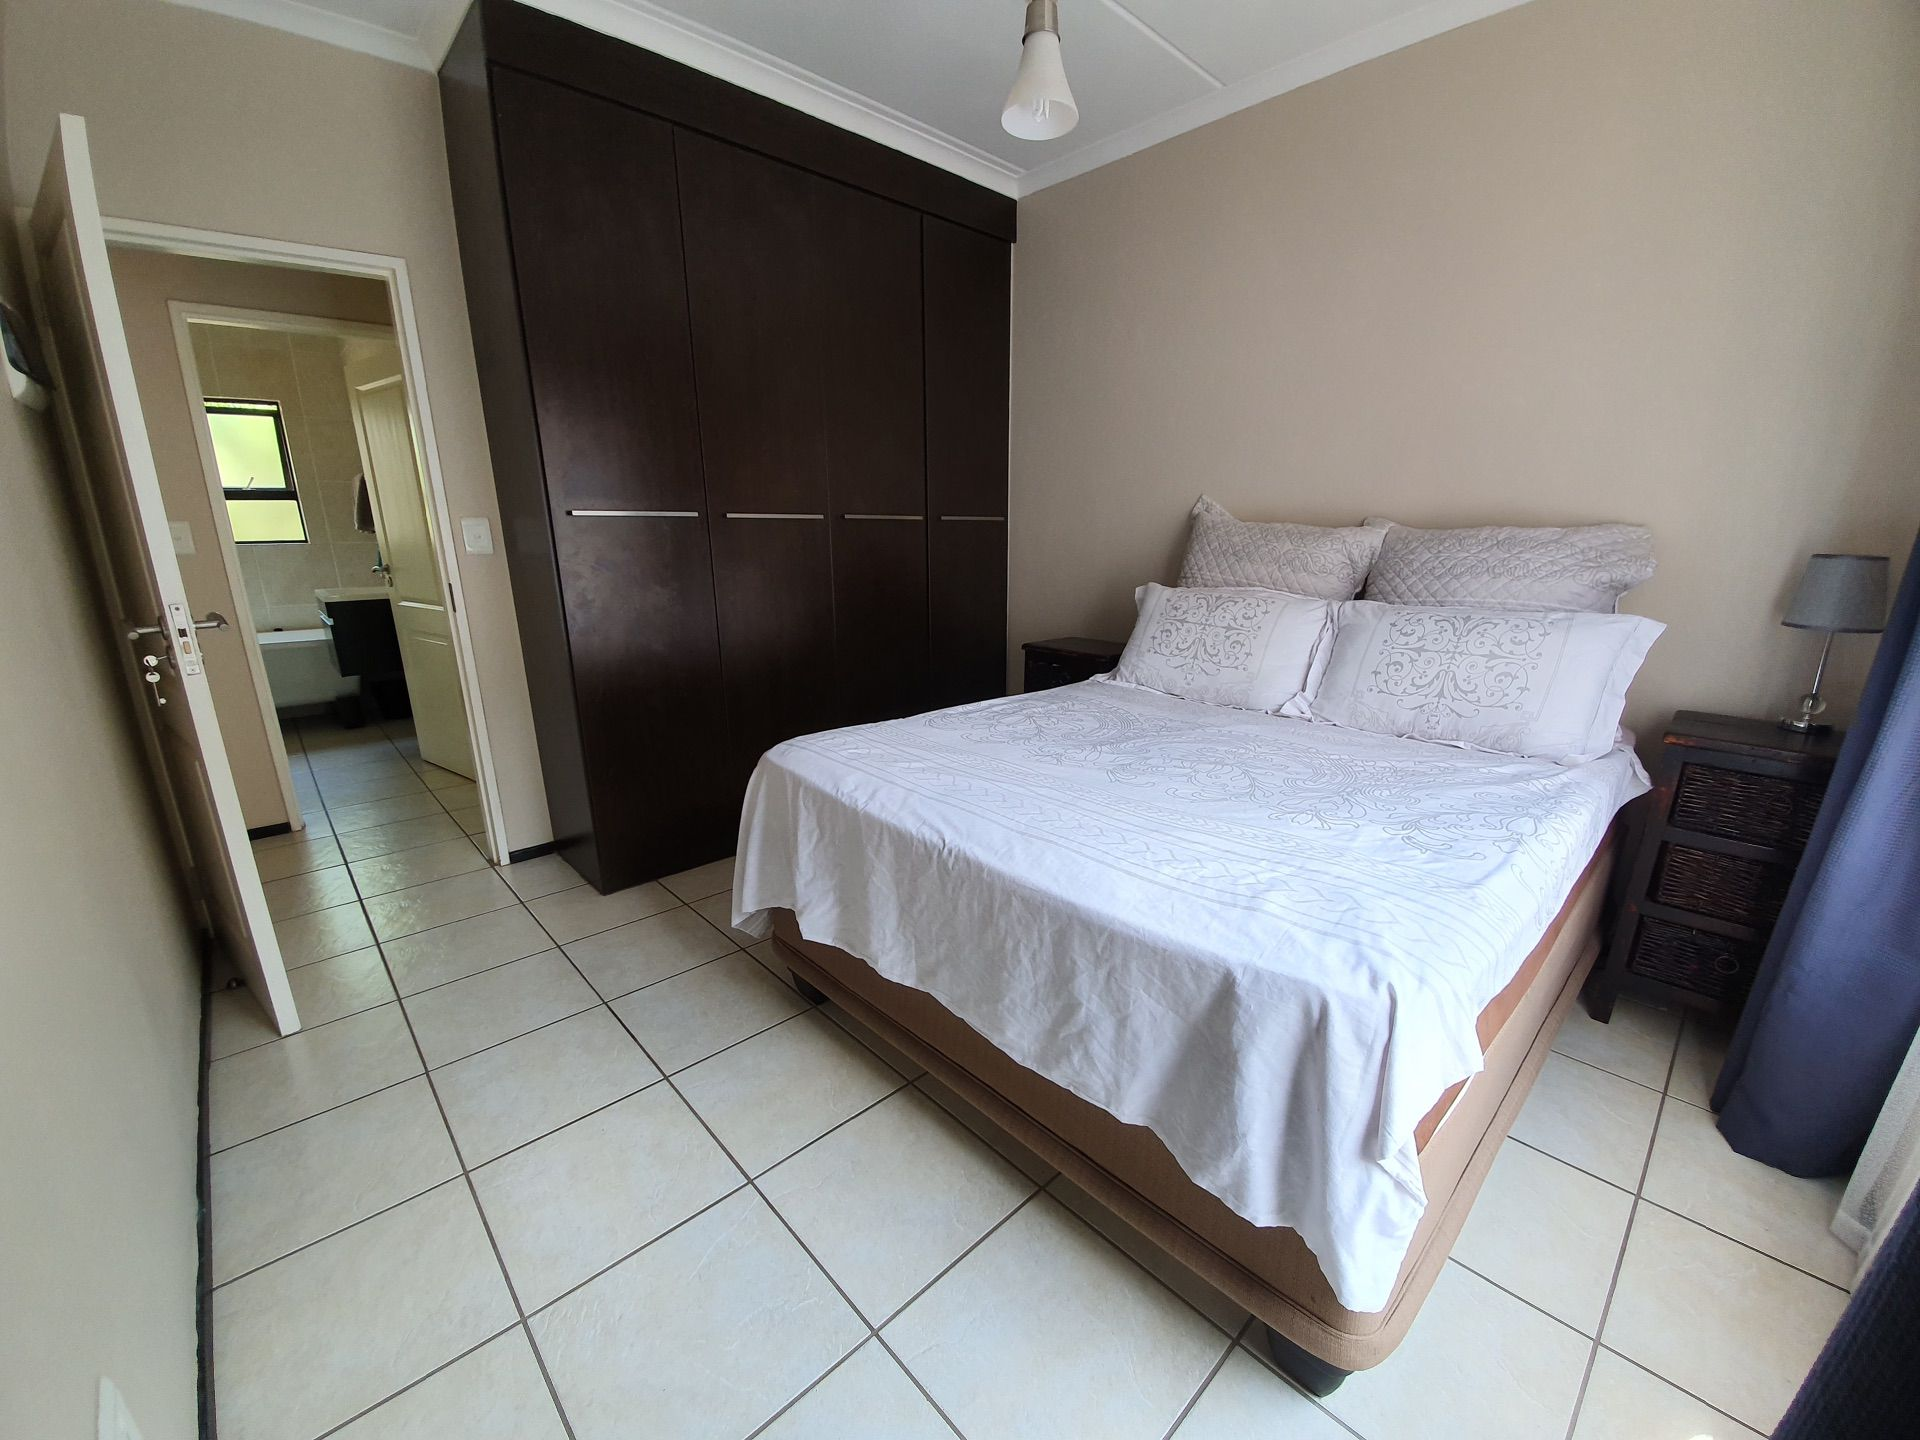 Master bedroom with built-in cupboards